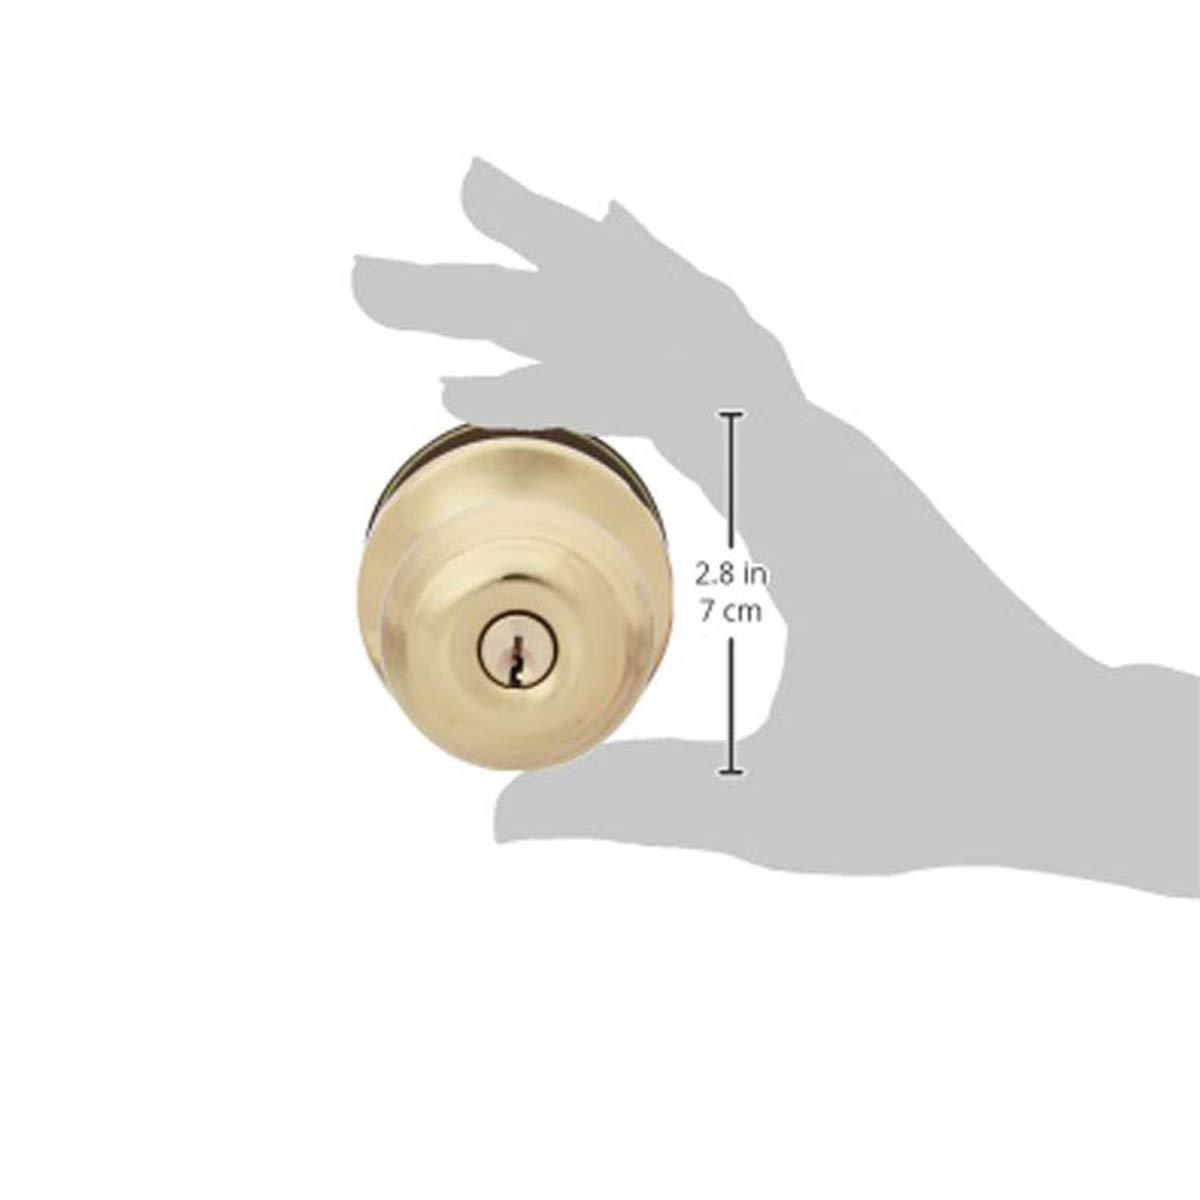 AmazonBasics Entry Knob and Deadbolt - Classic - Polished Brass – 2-Pack by AmazonBasics (Image #4)